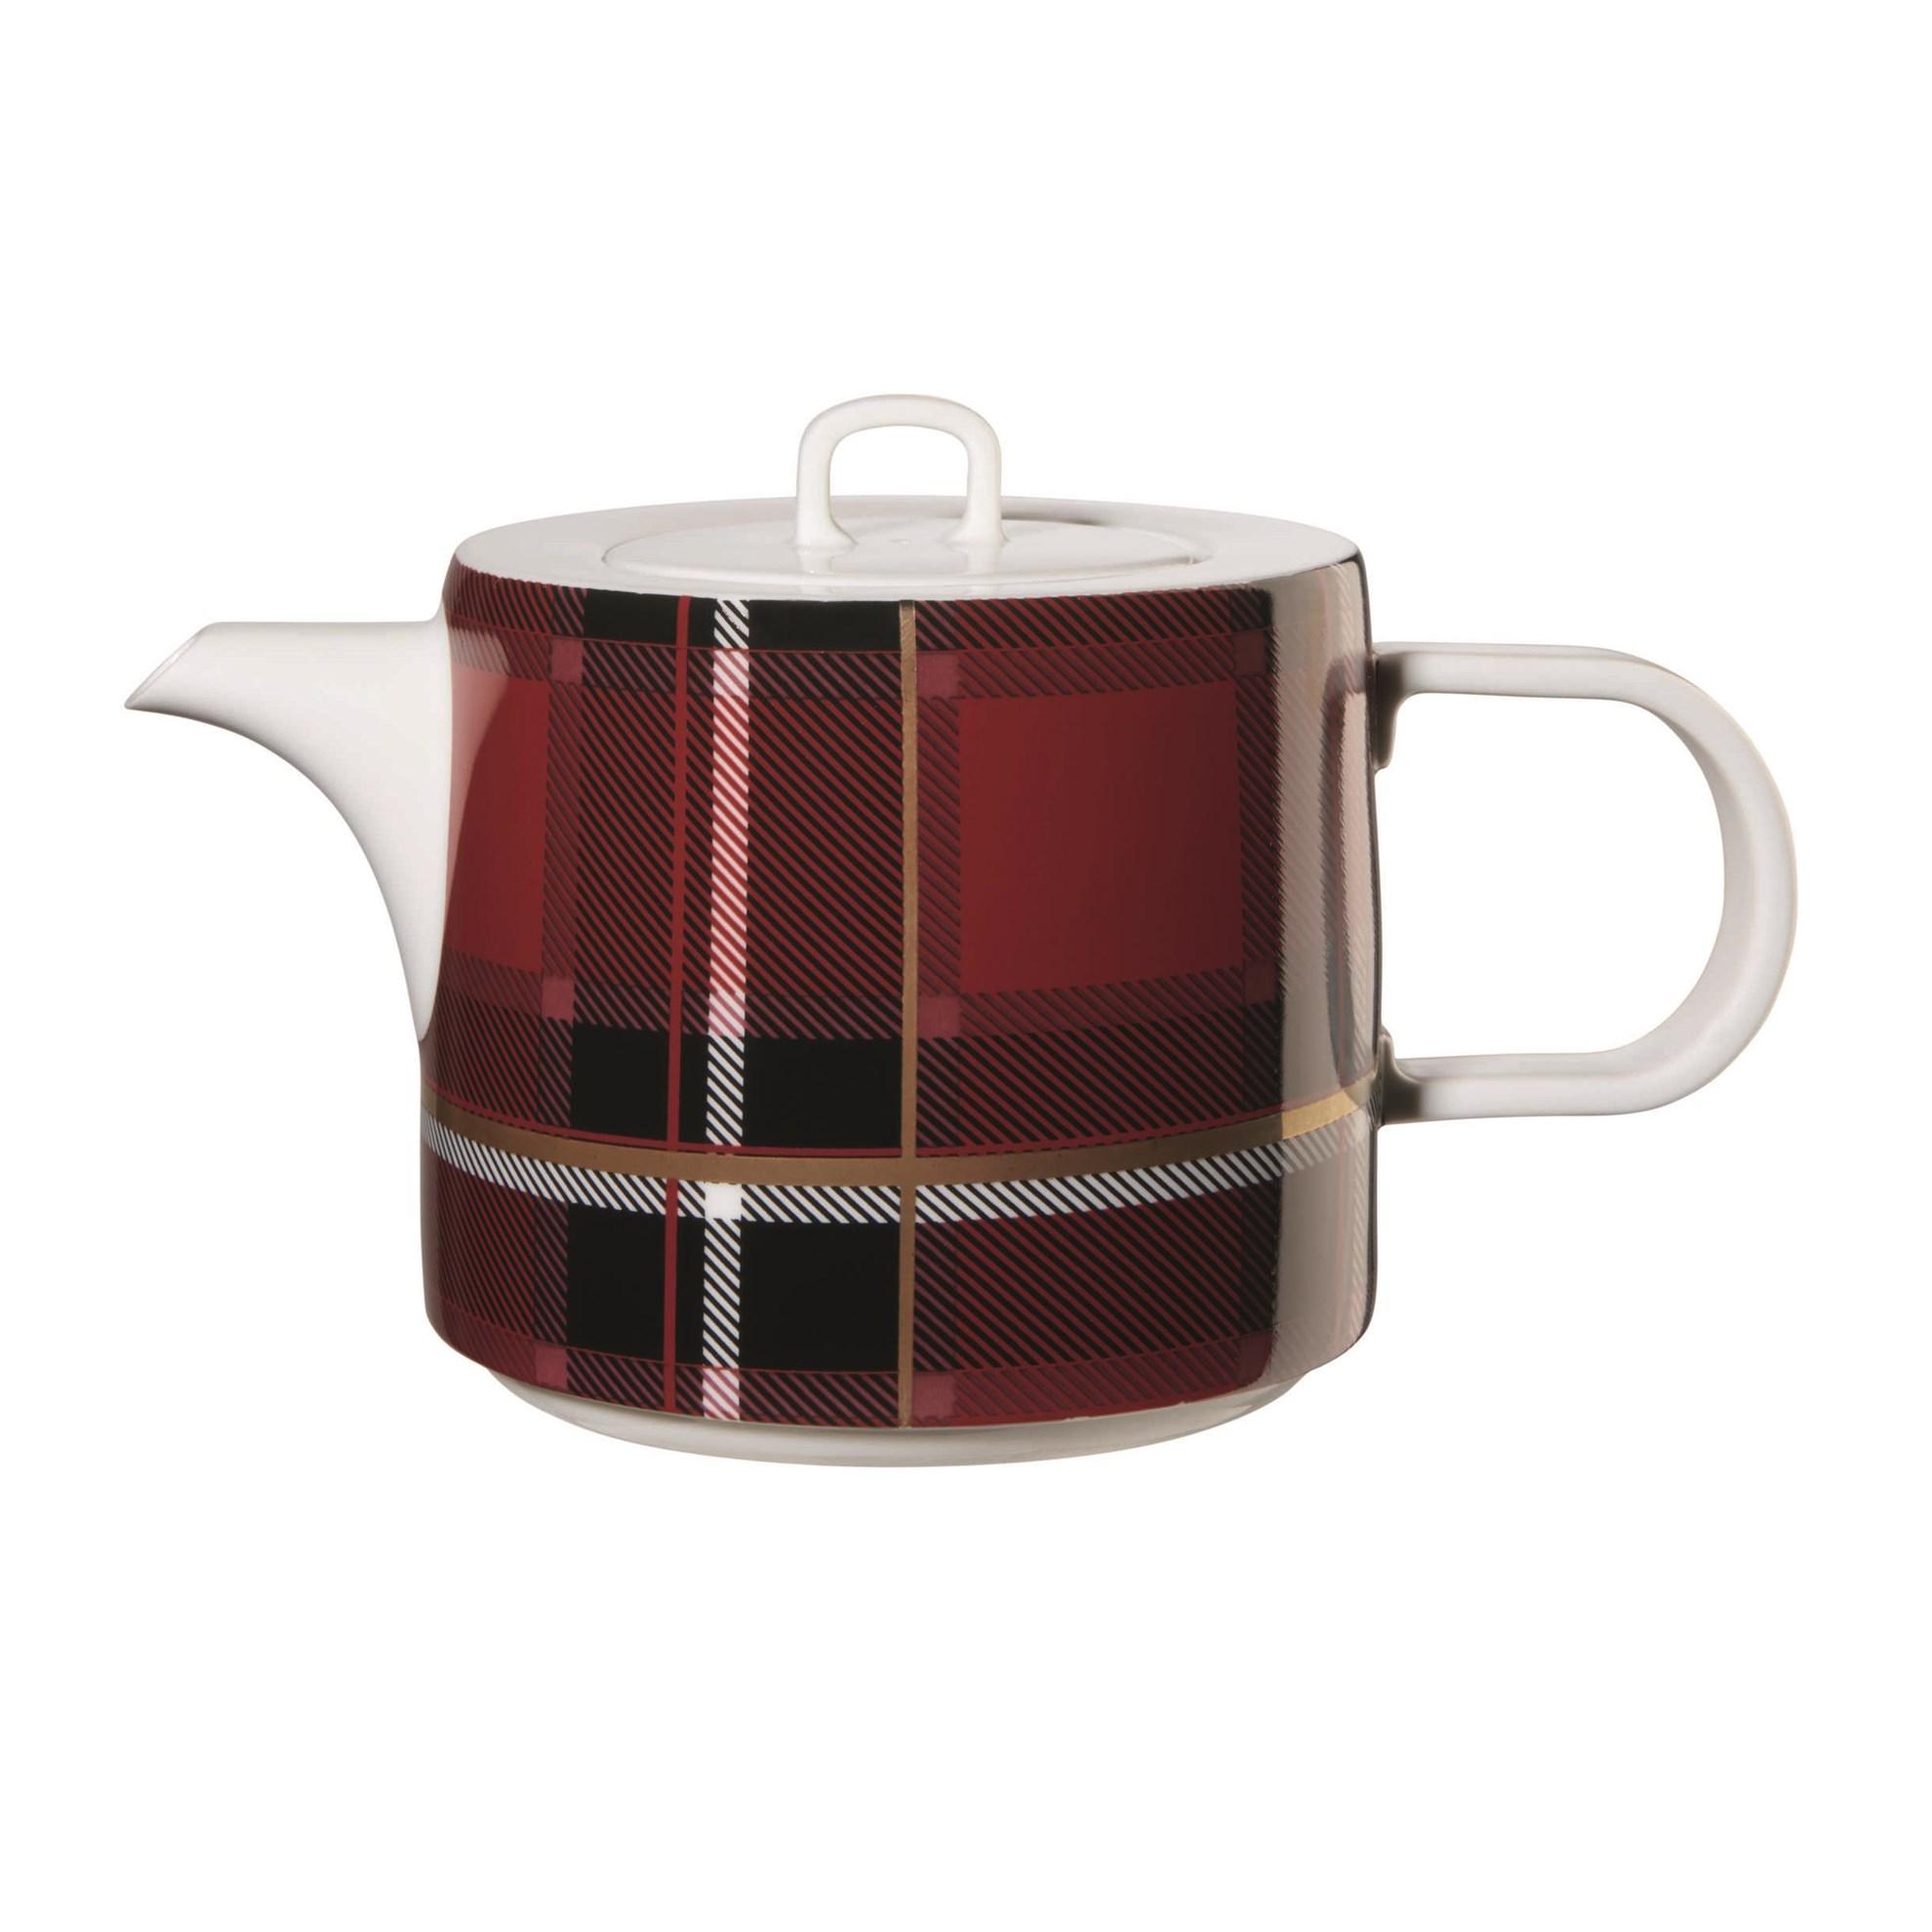 Konvice na čaj TARTAN 1,25 l_0